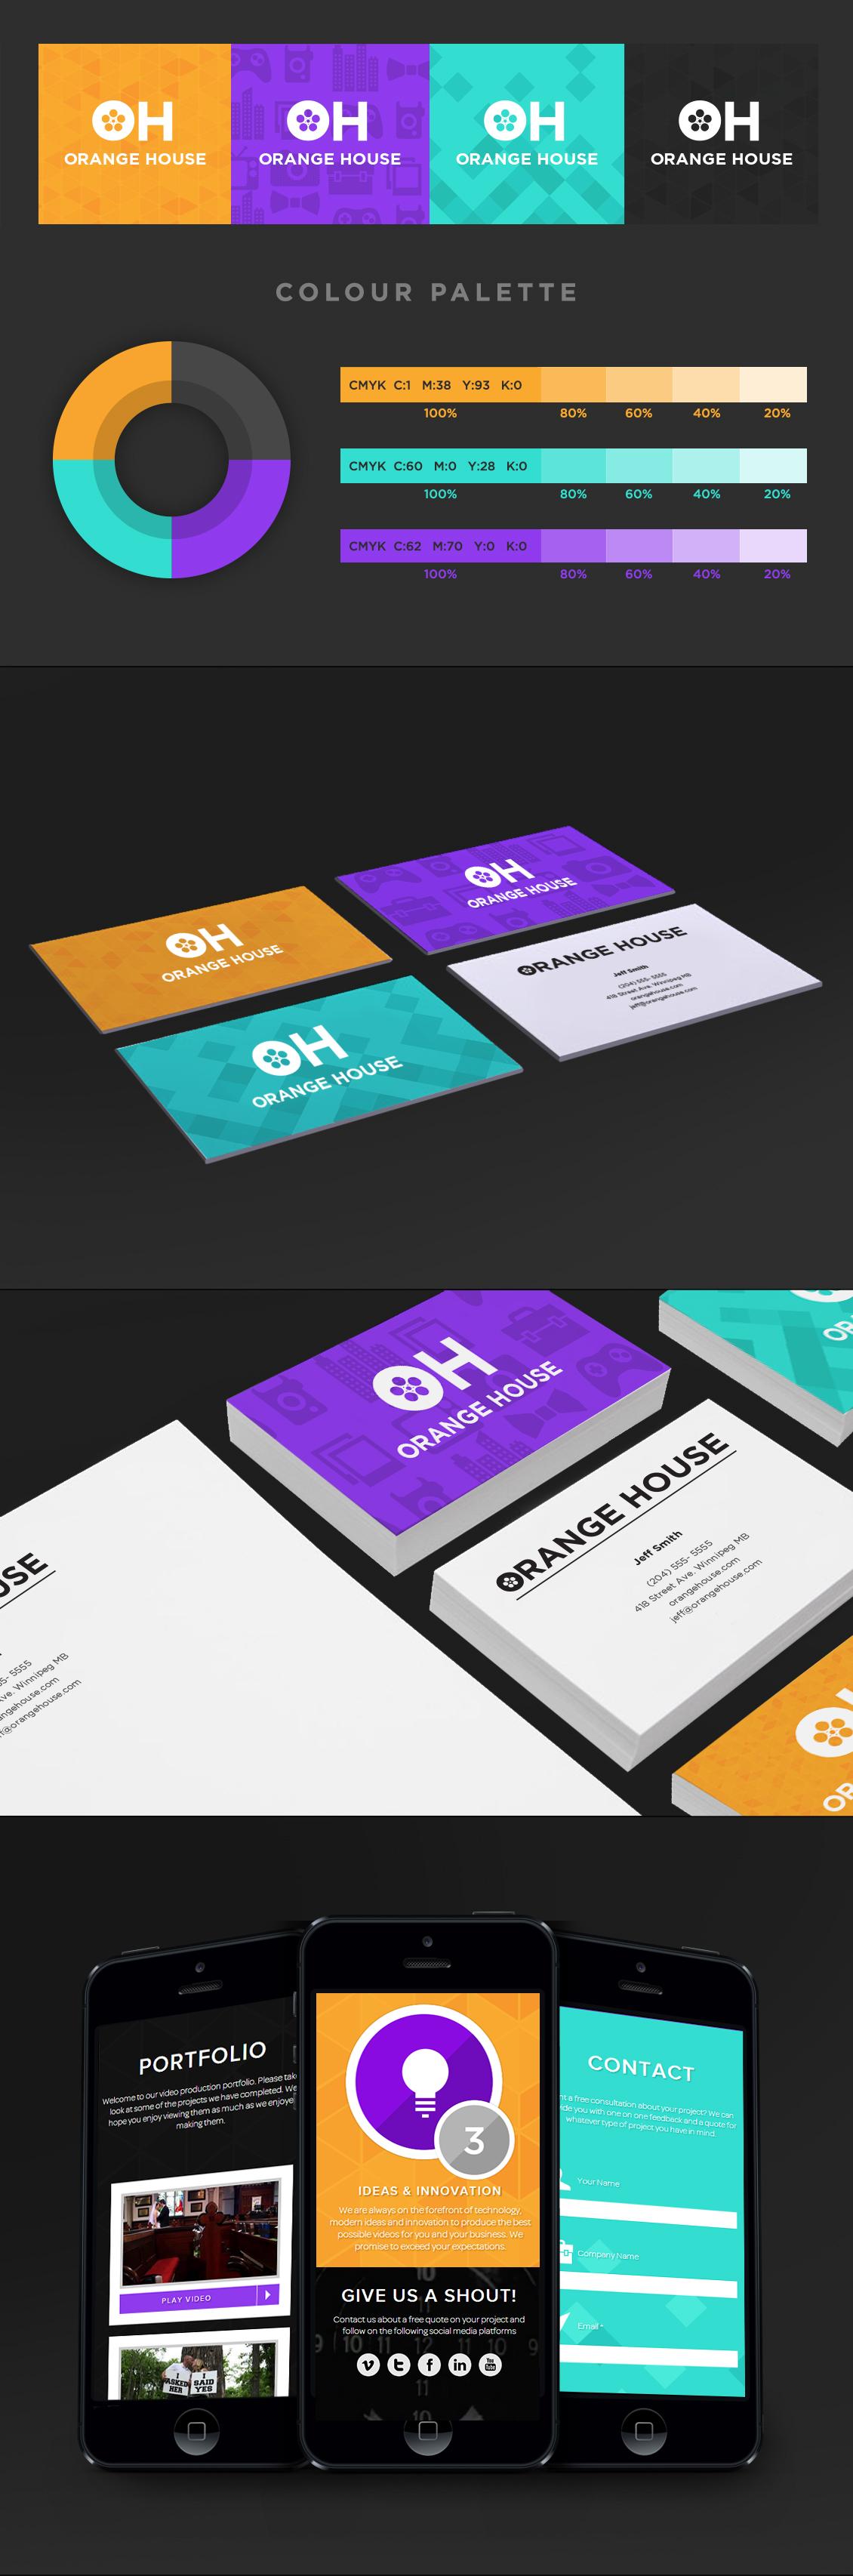 winnipeg-web-design-cool.jpg